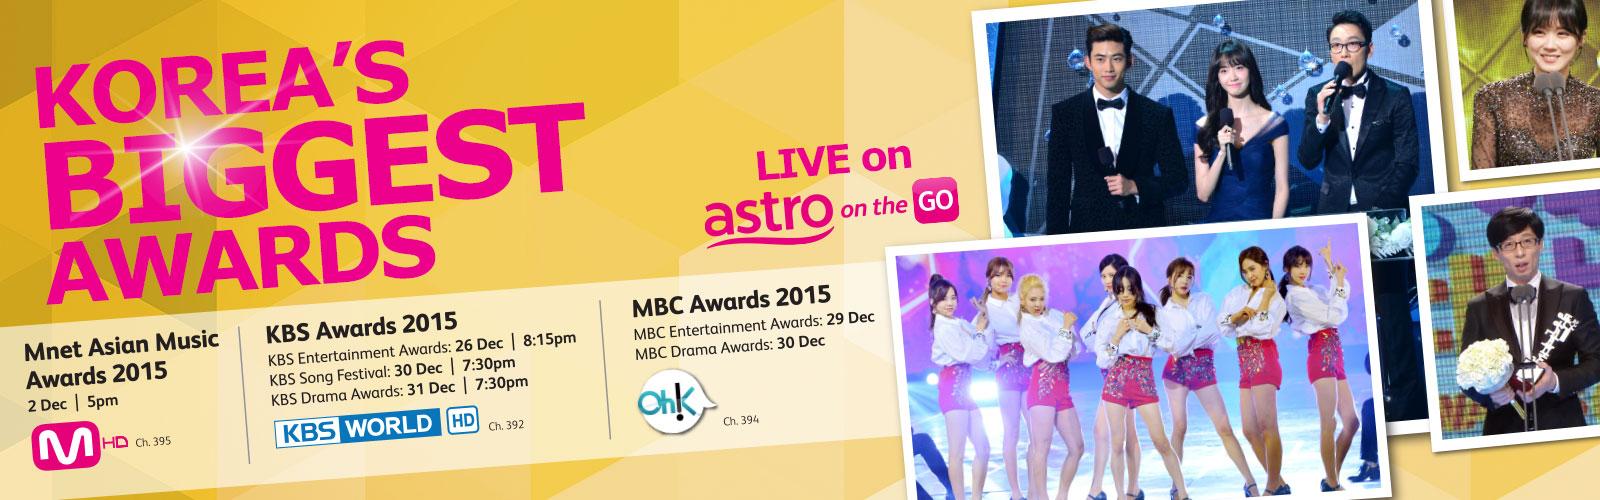 astro on the go koreas-biggest-awards